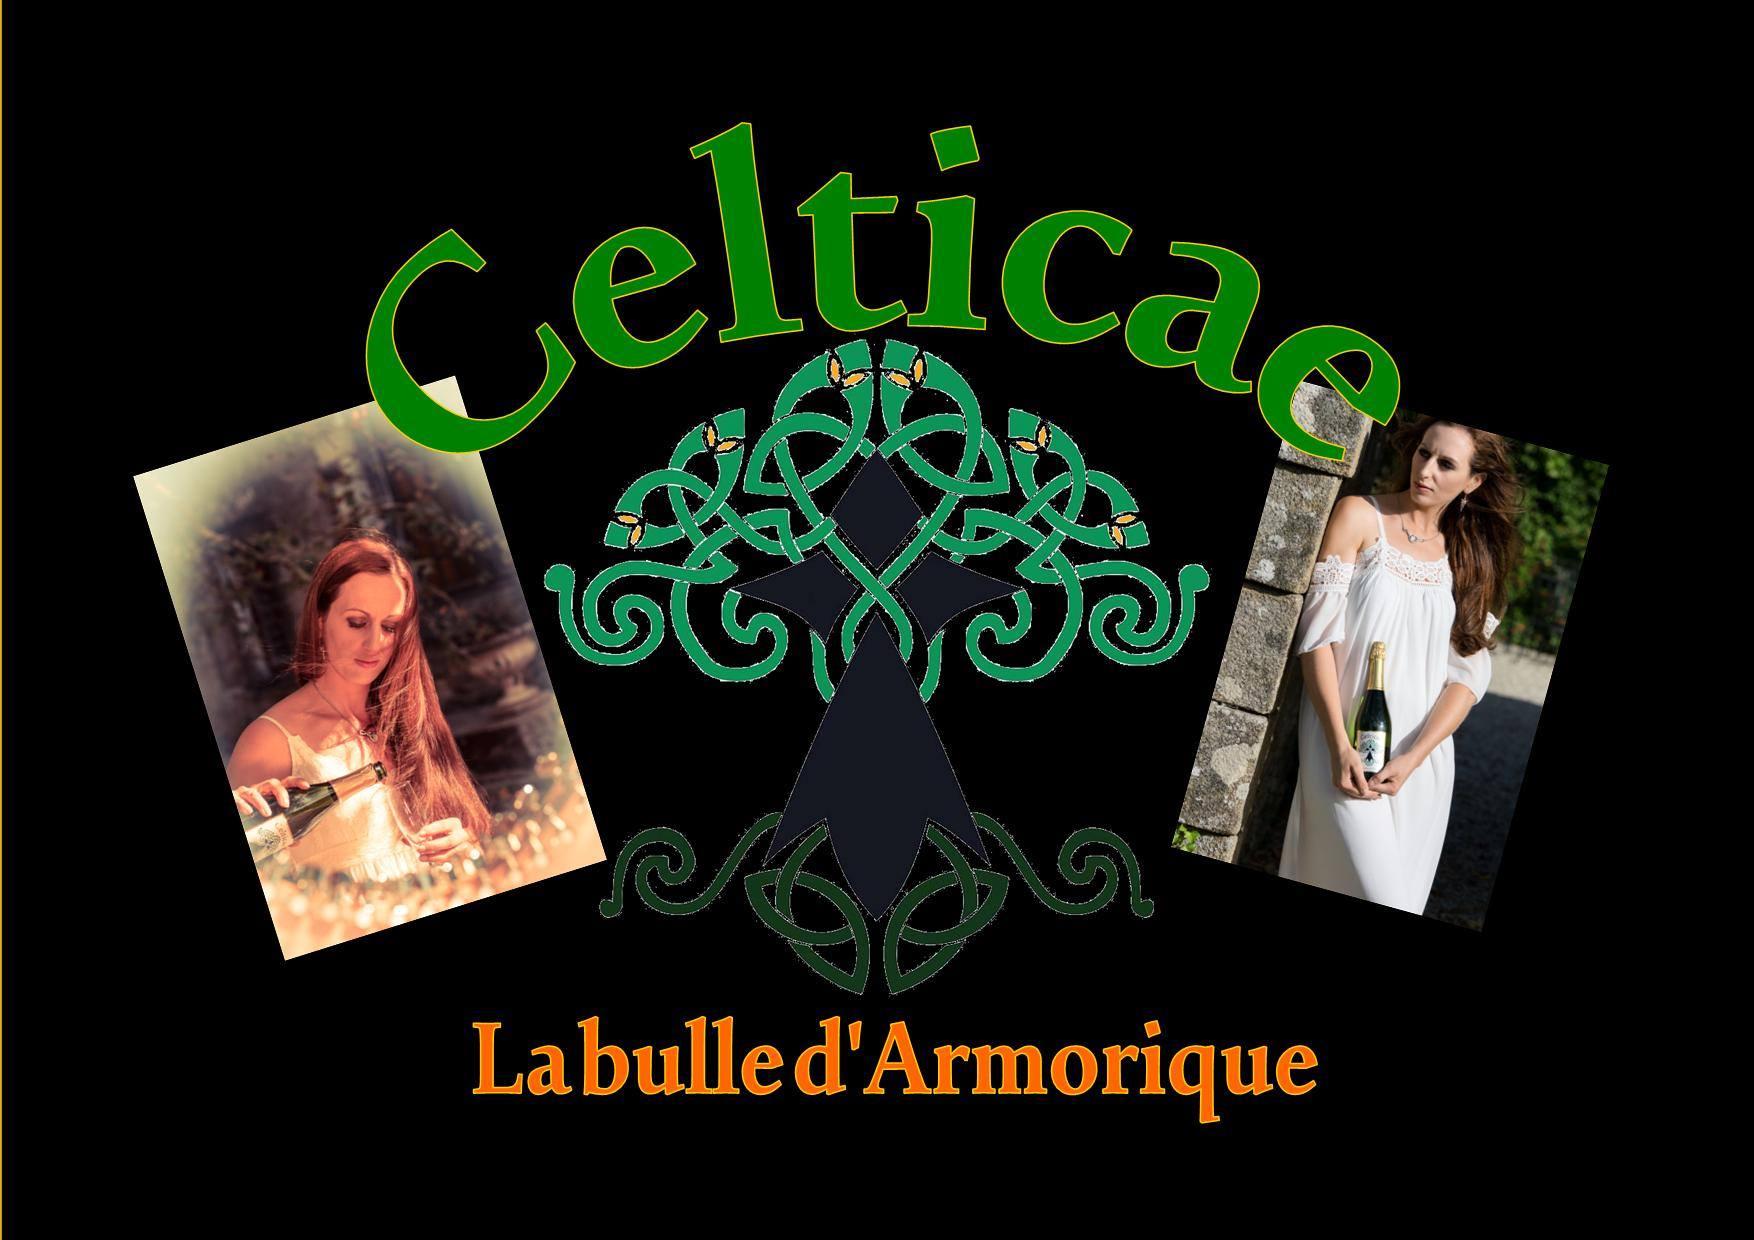 Dana et celticae 3